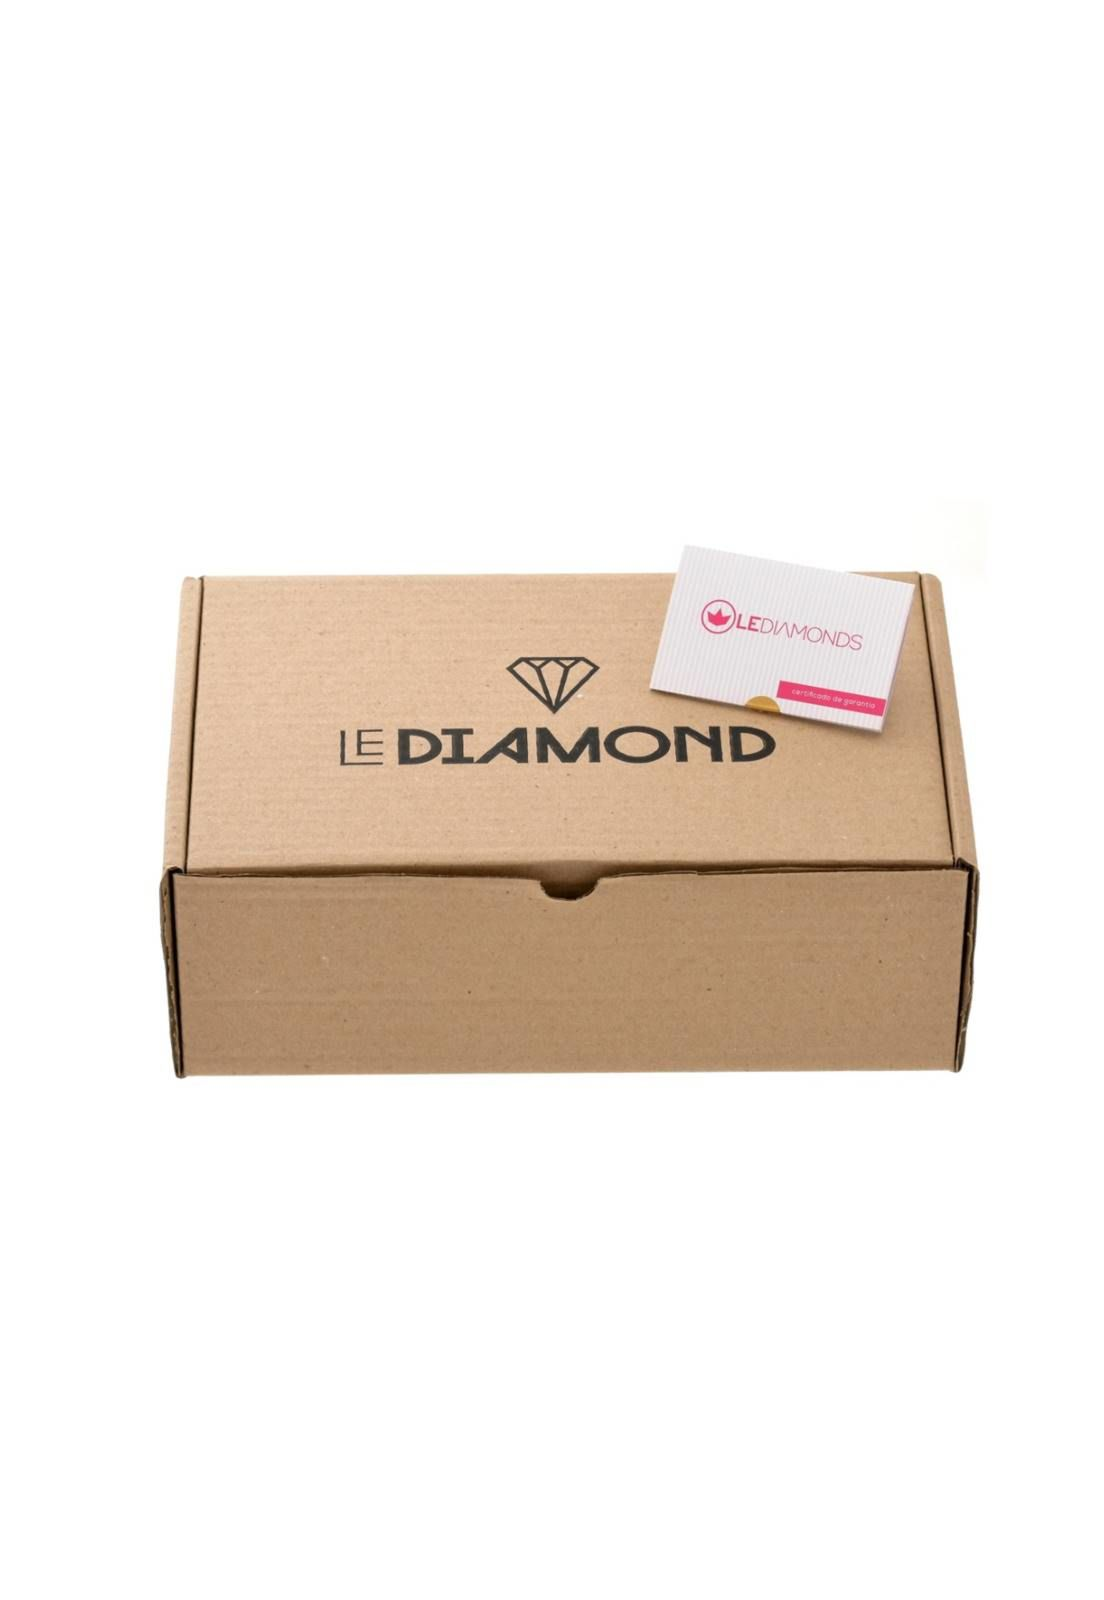 Brinco Le Diamond Concha Natural com Fios de Seda Azul